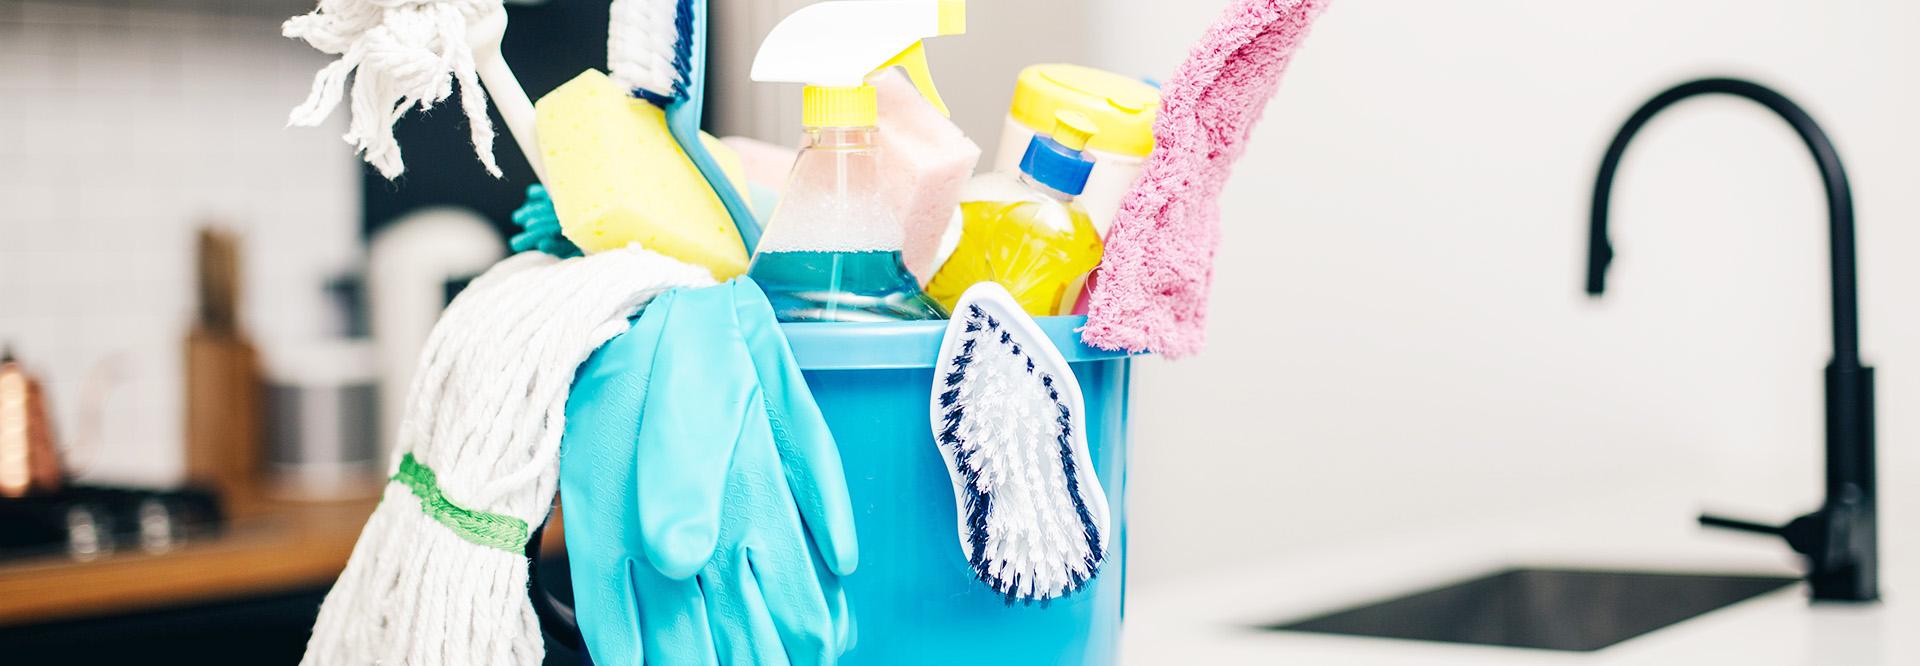 Rakitzis Cleaning